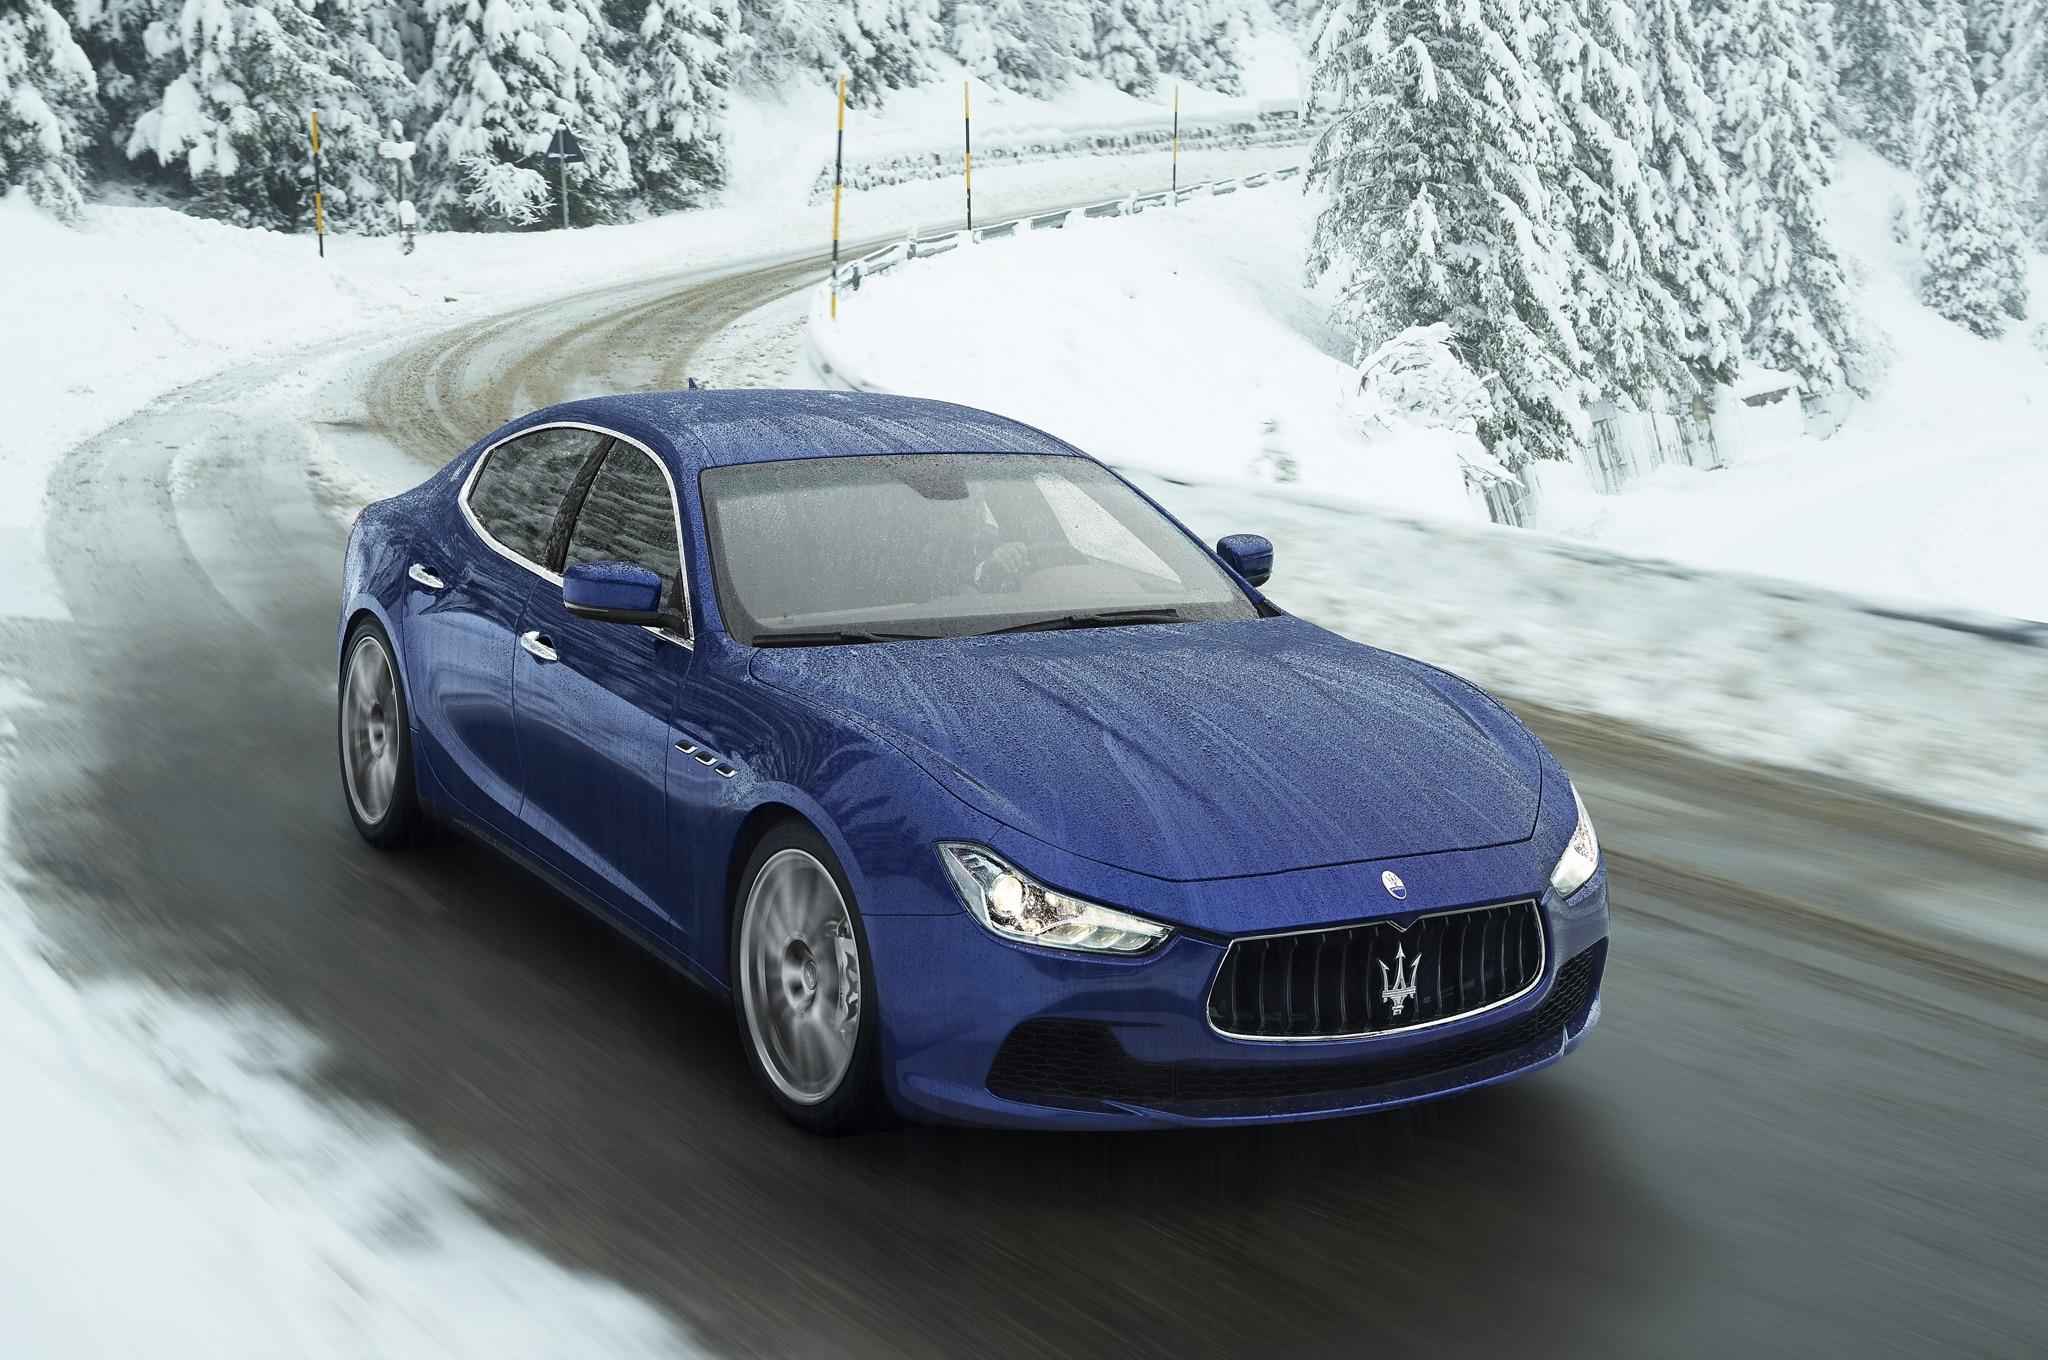 2014 Maserati Ghibli S Q4 Review